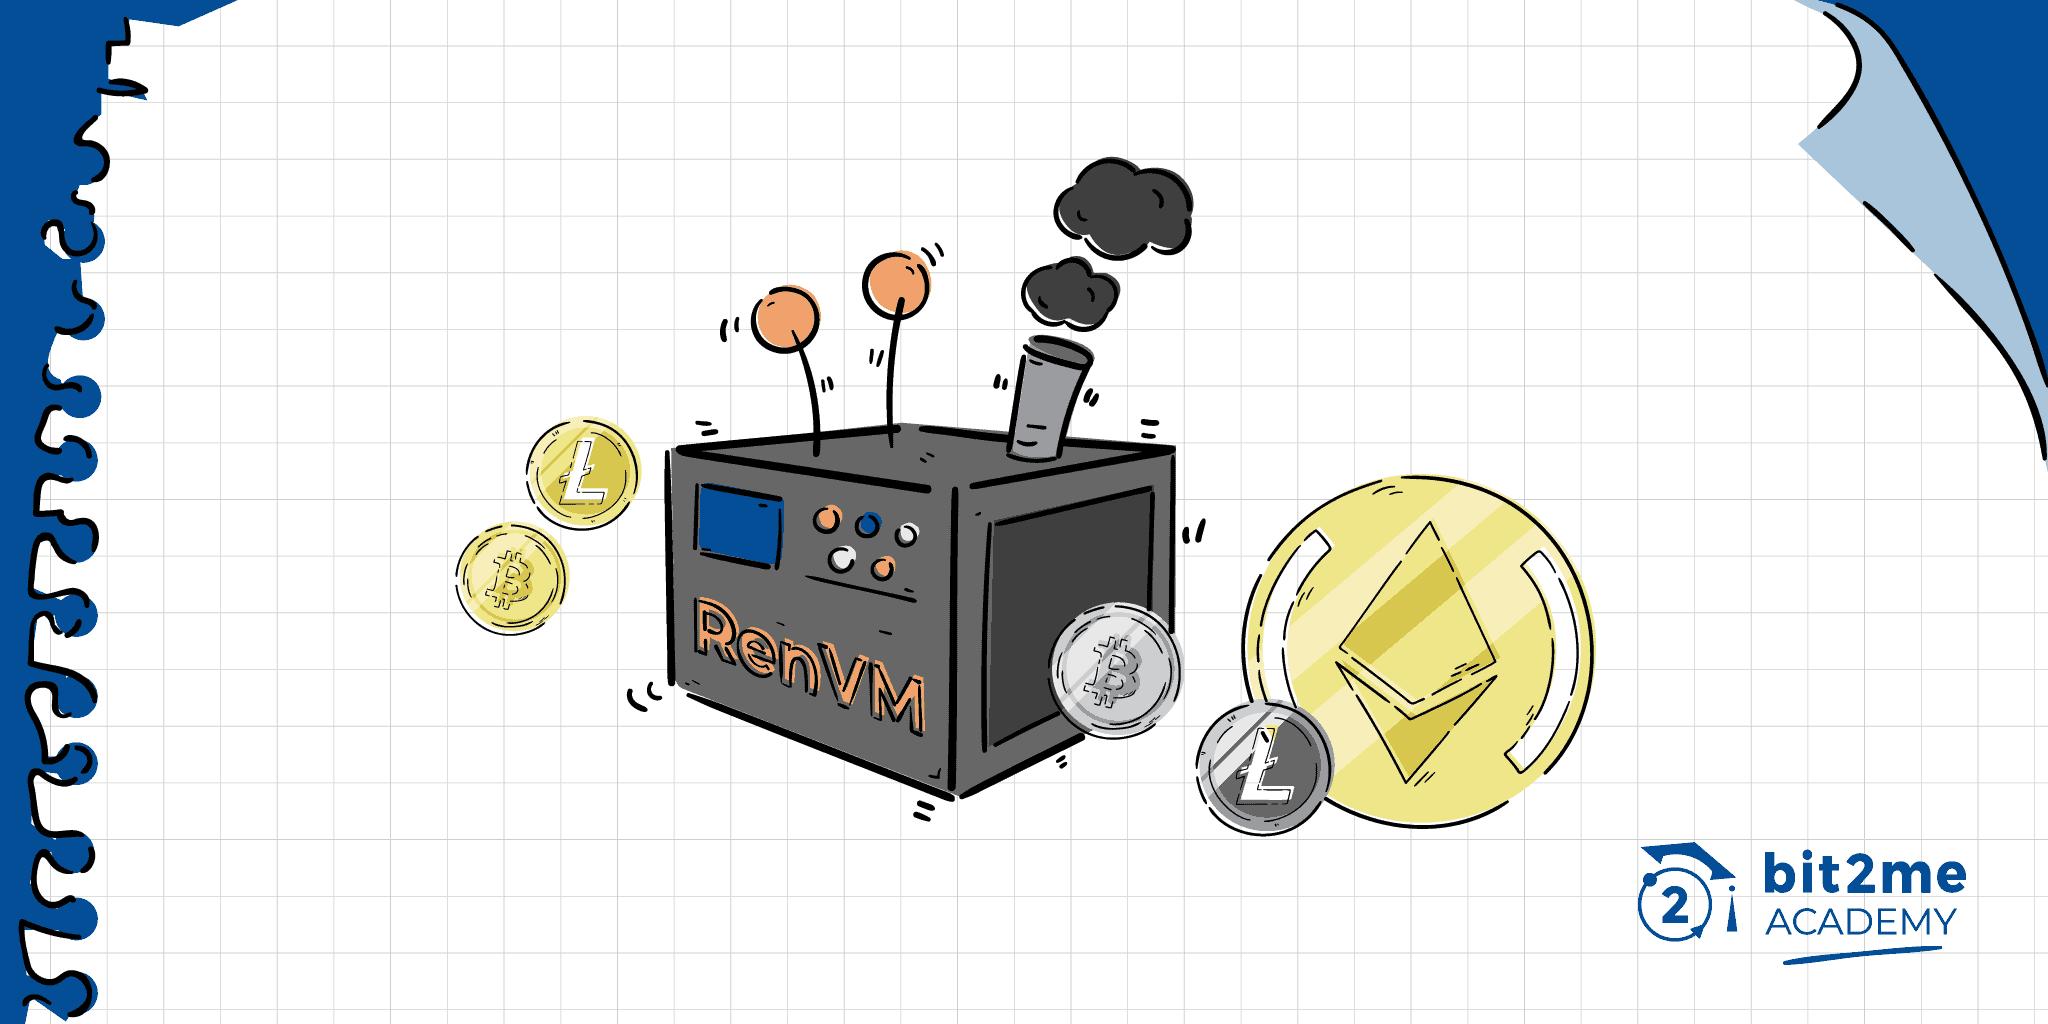 renvm, ren virtual machine, ren virtual machine